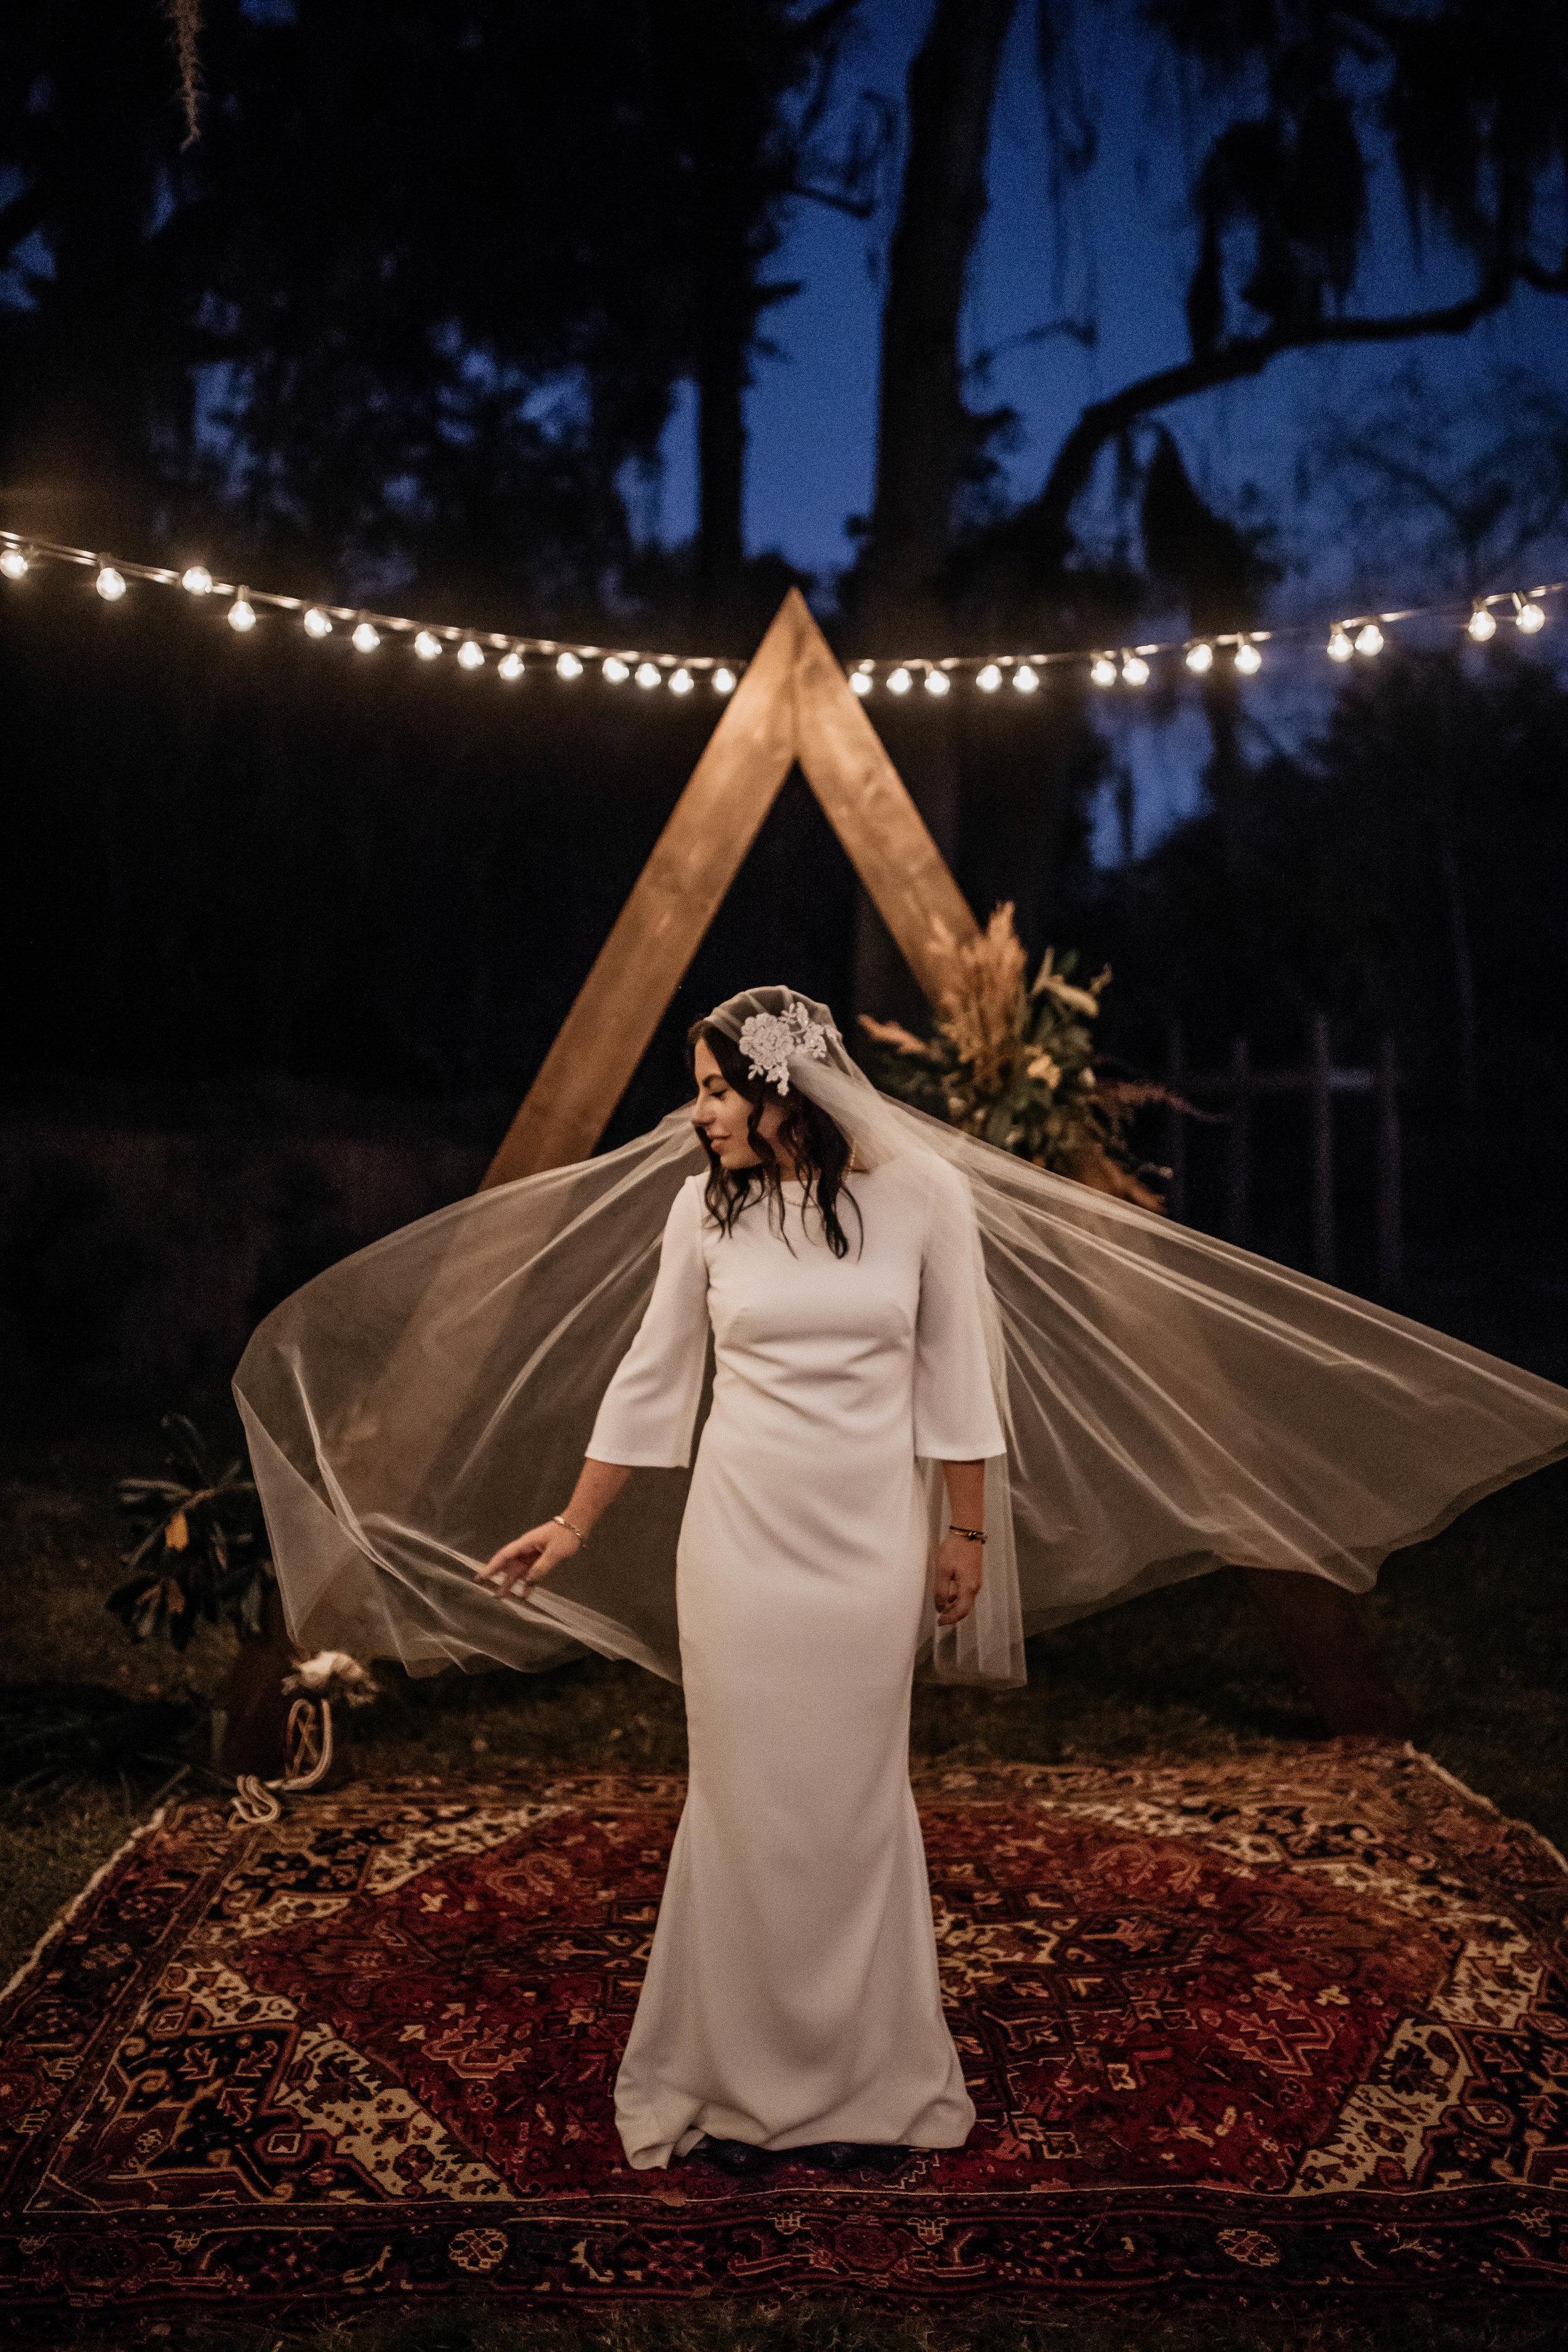 Bride Photos | American Traditional Tattoo Themed Eco Friendly Dark Florida Wedding